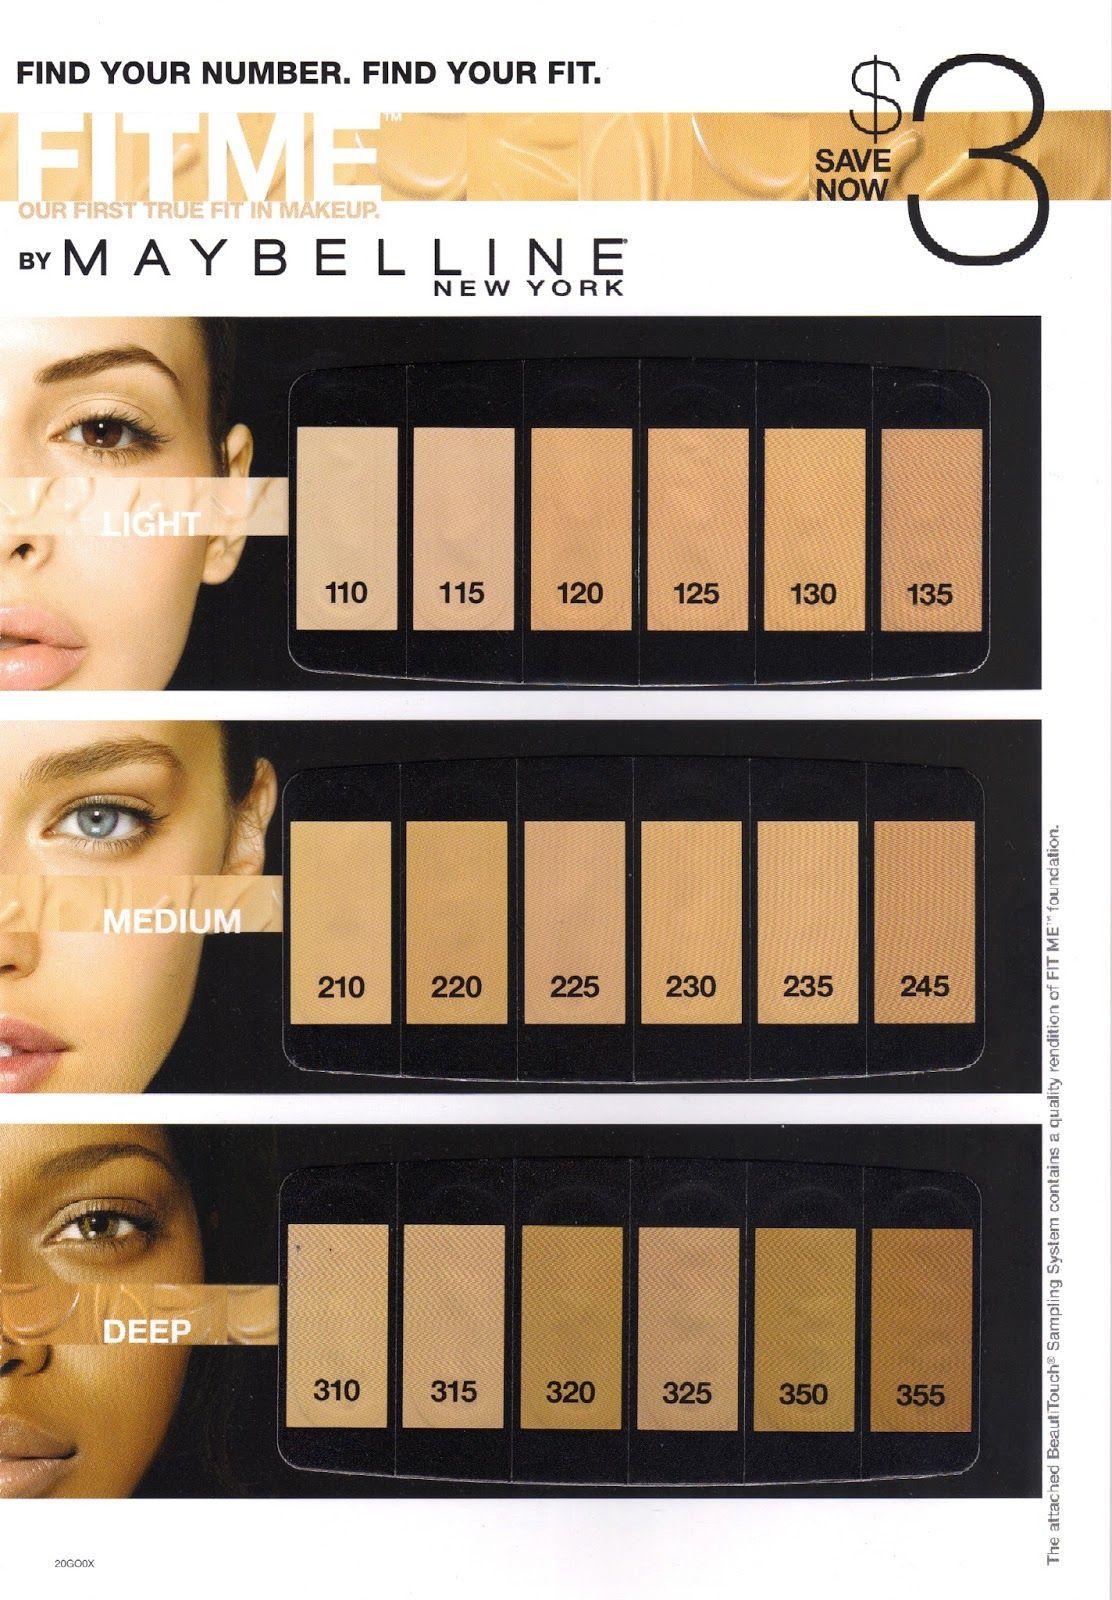 520d73c5eee KIKAYSIMARIA: Maybelline Fit Me! Liquid Foundation | Makeup Tutorial ...